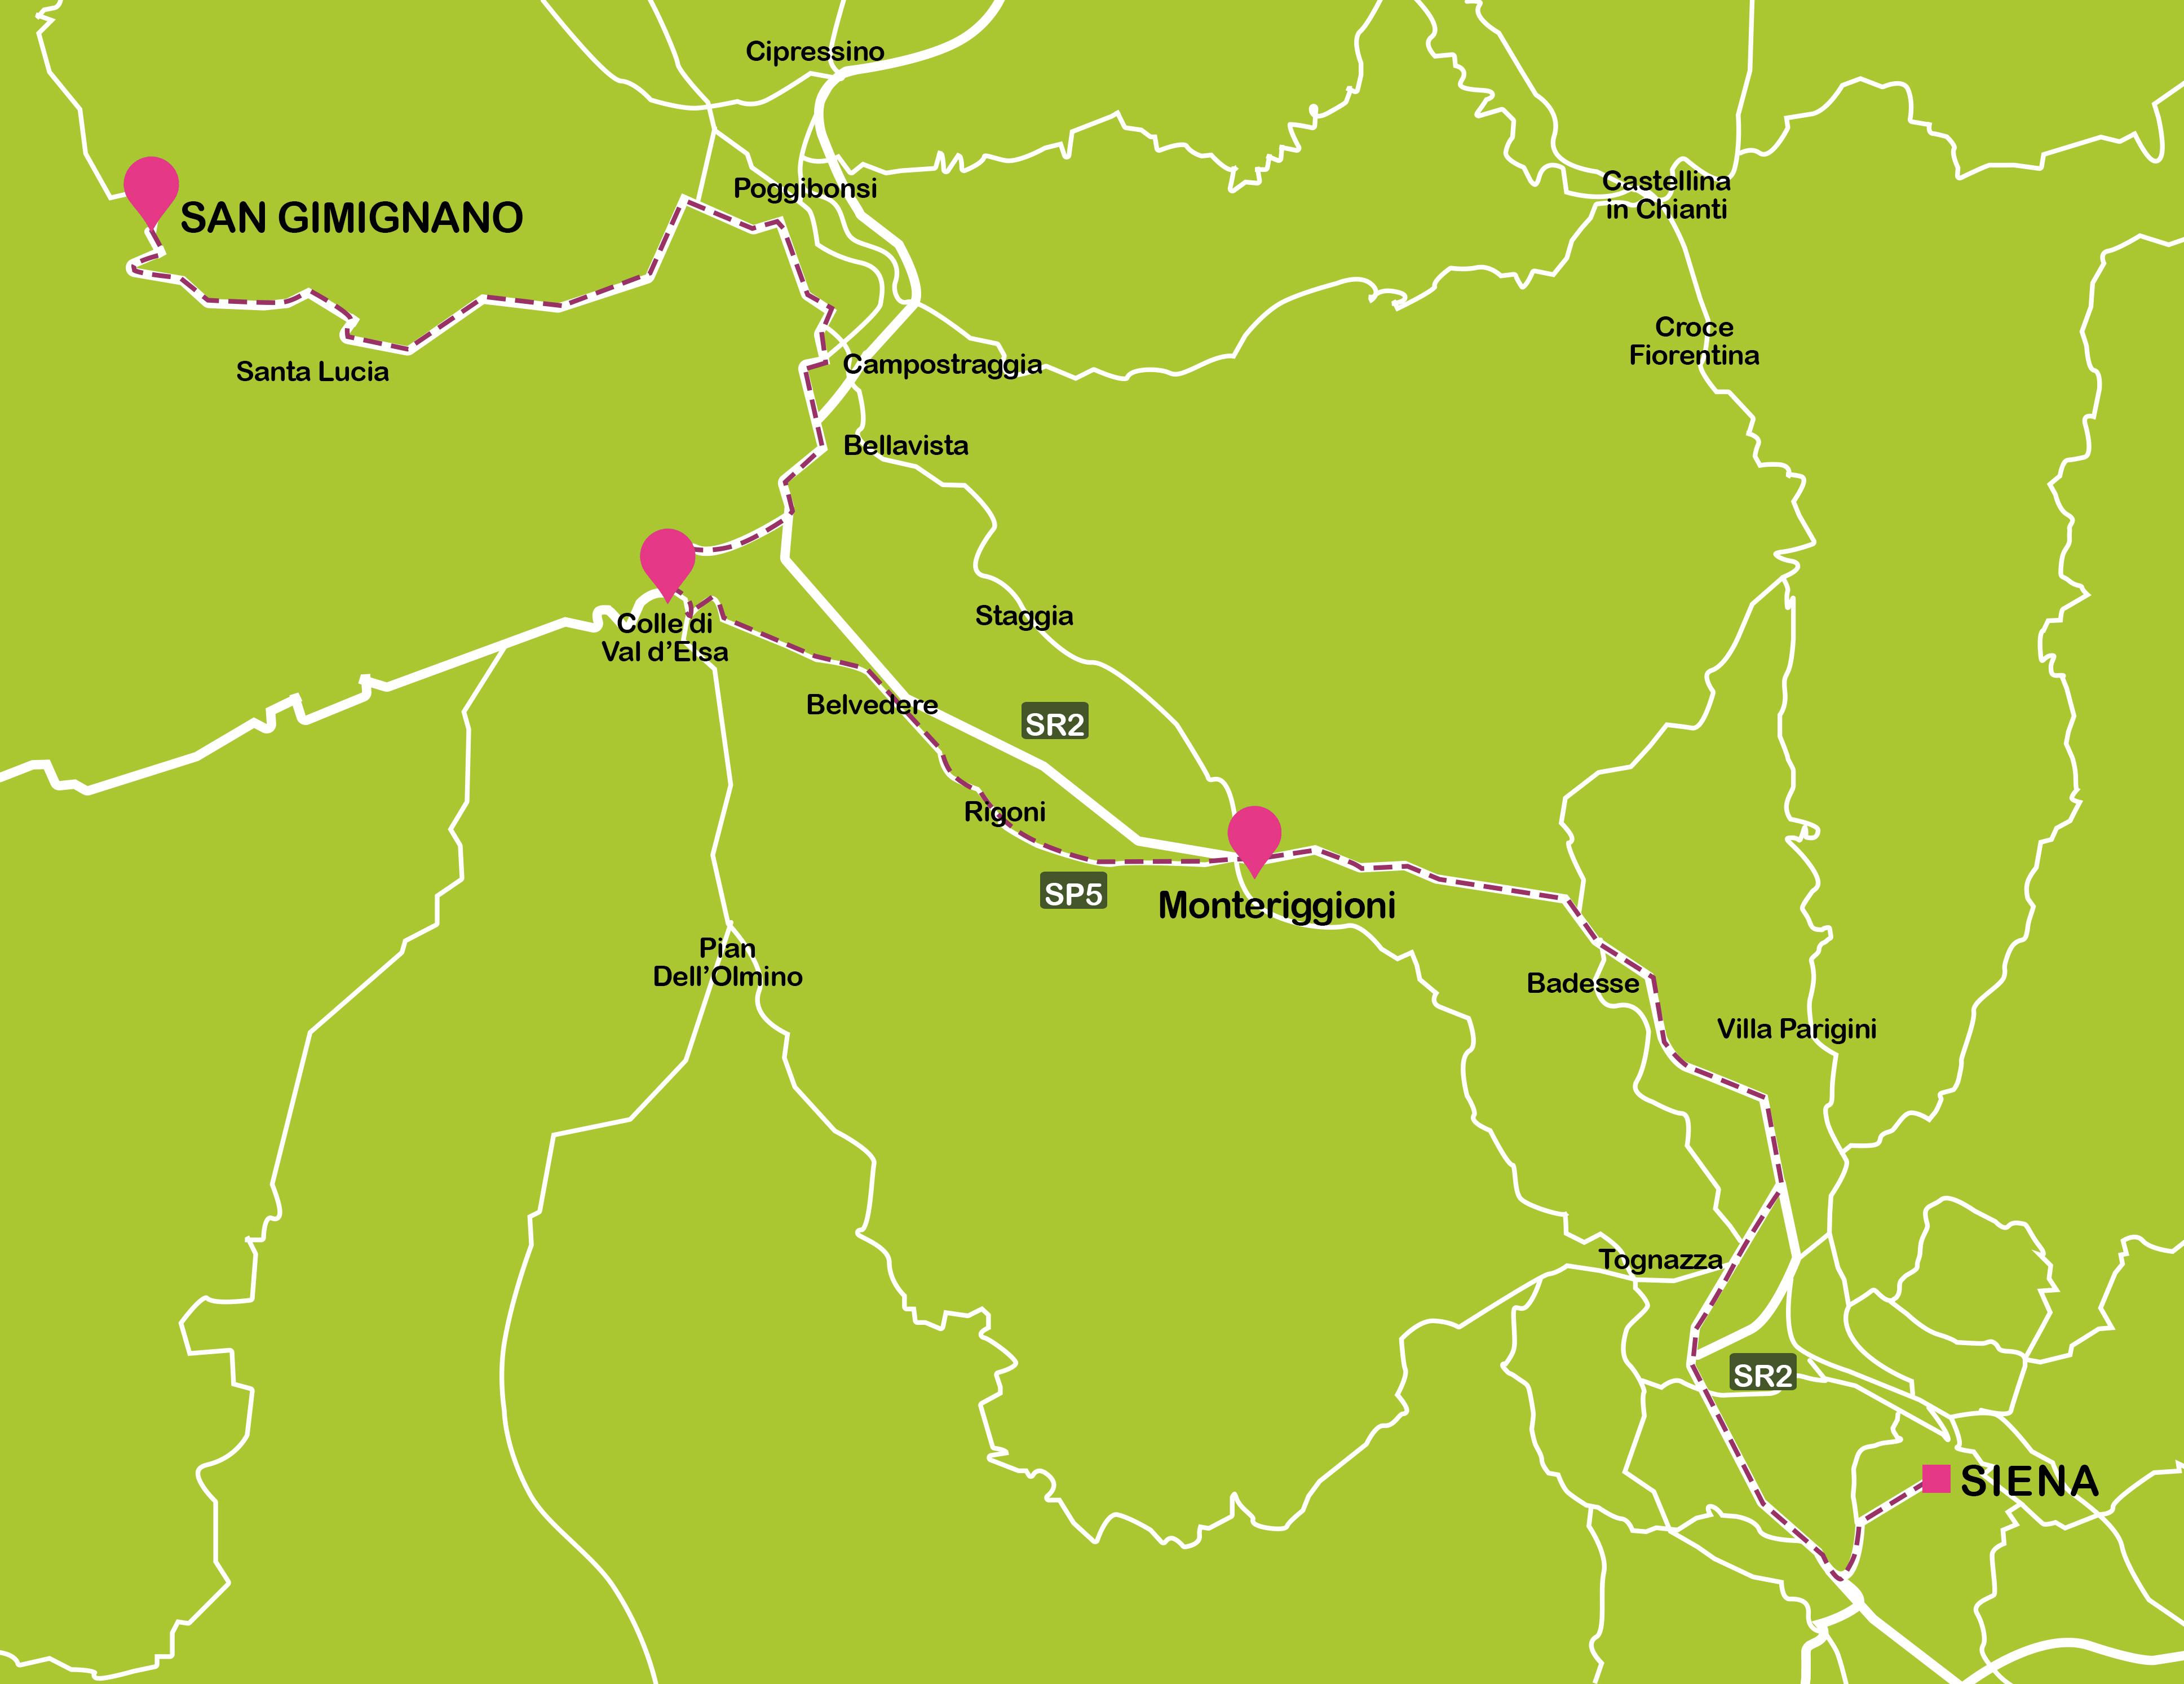 Norte de la Toscana: Monteriggioni, San Gimignano